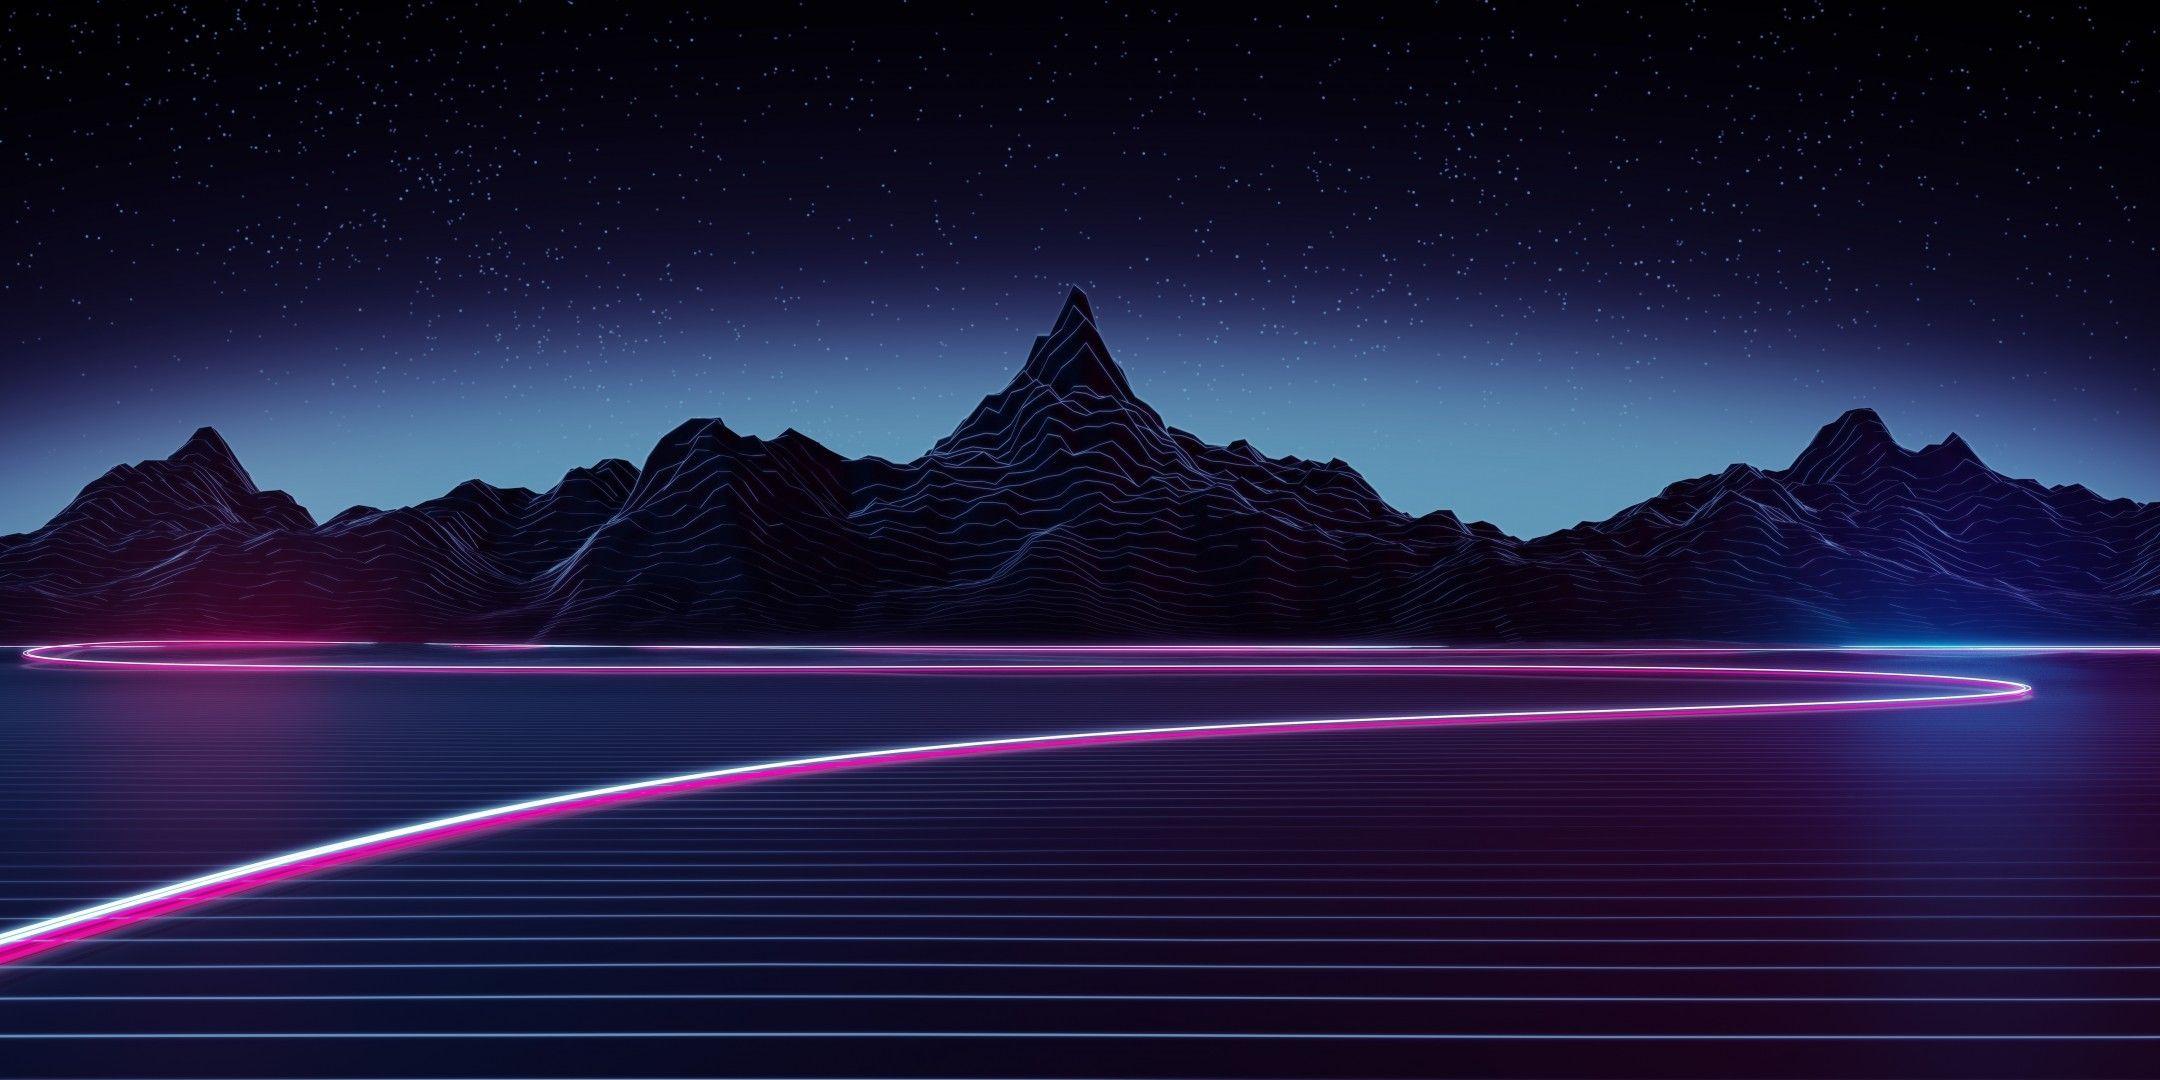 Neon Aesthetic 4k Wallpapers Wallpaper Cave